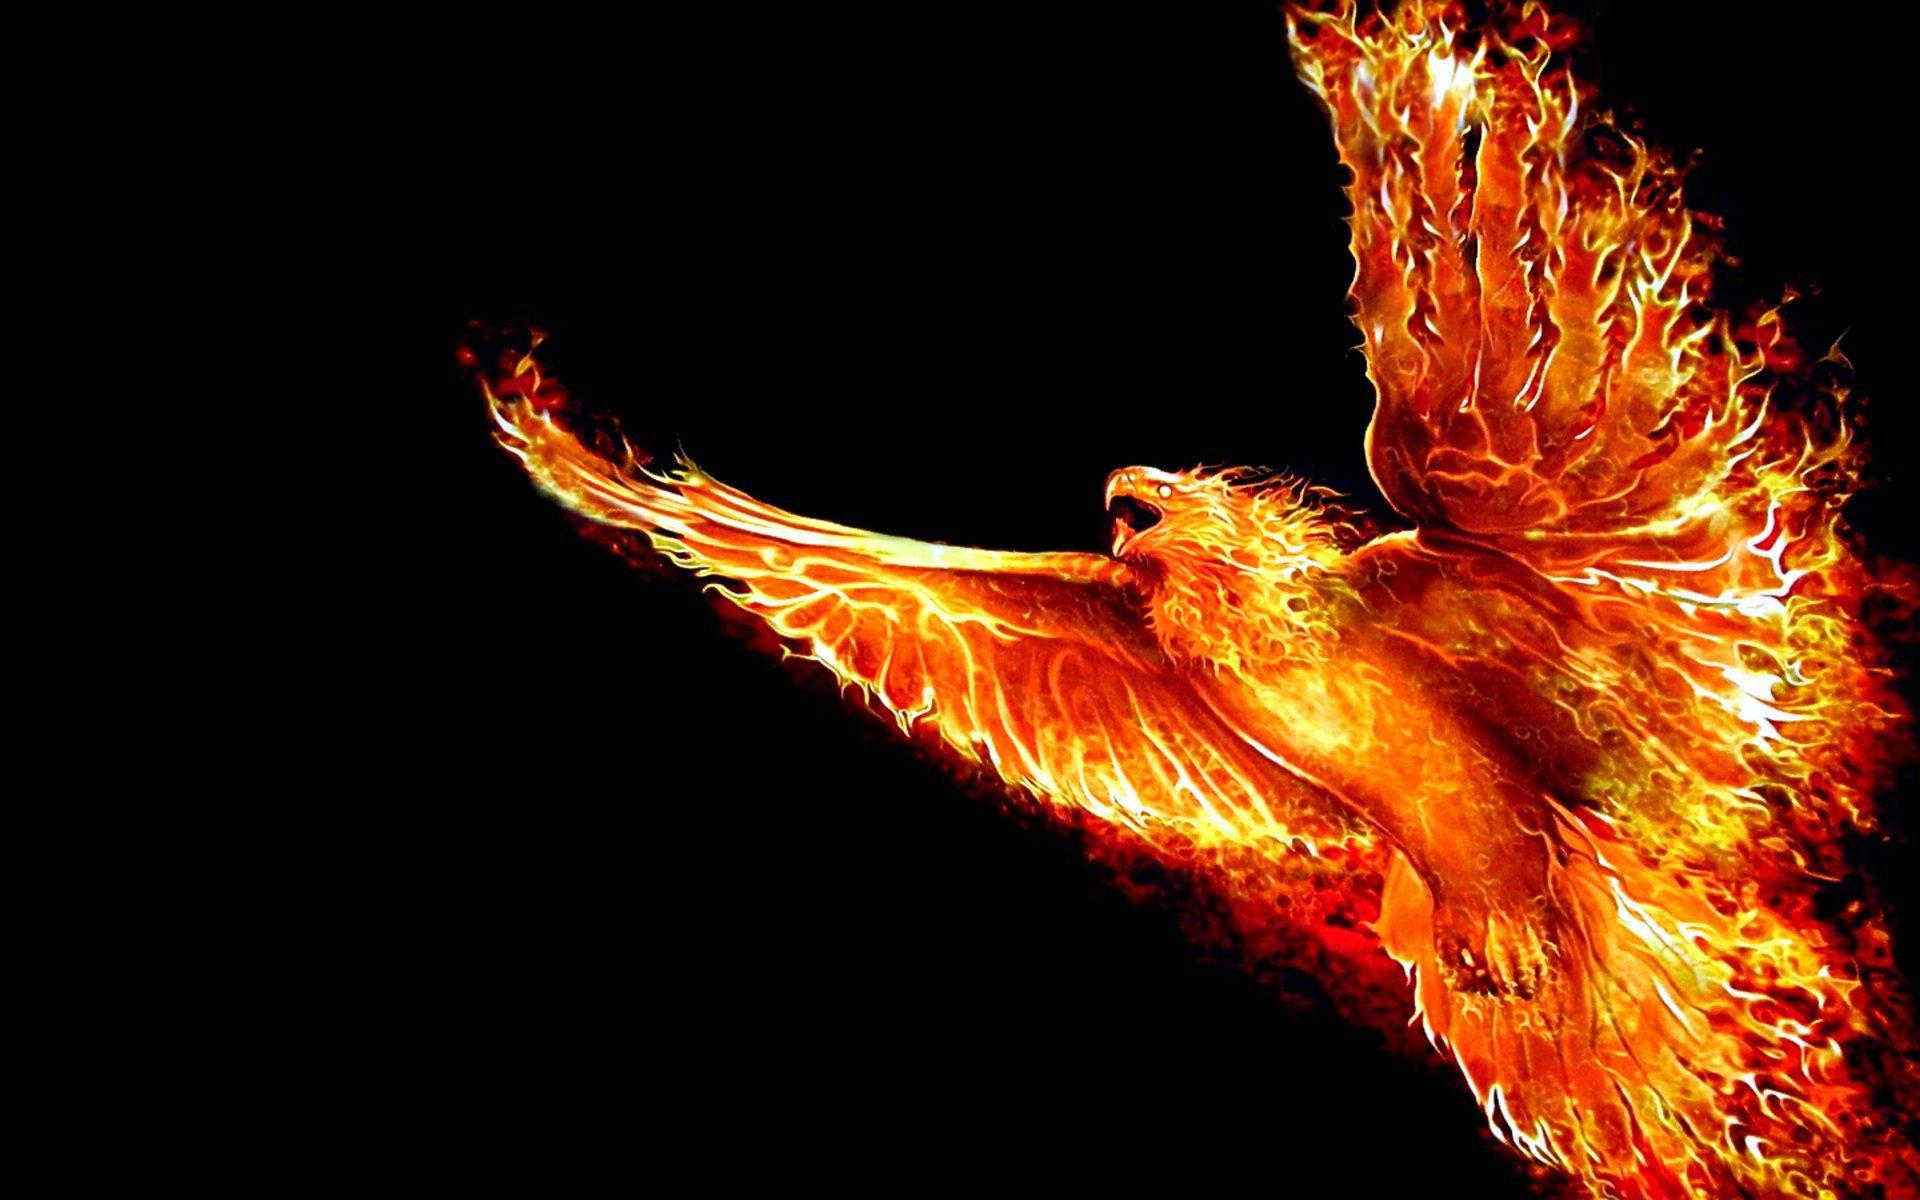 3д обои, Феникс, птица огненная, hd